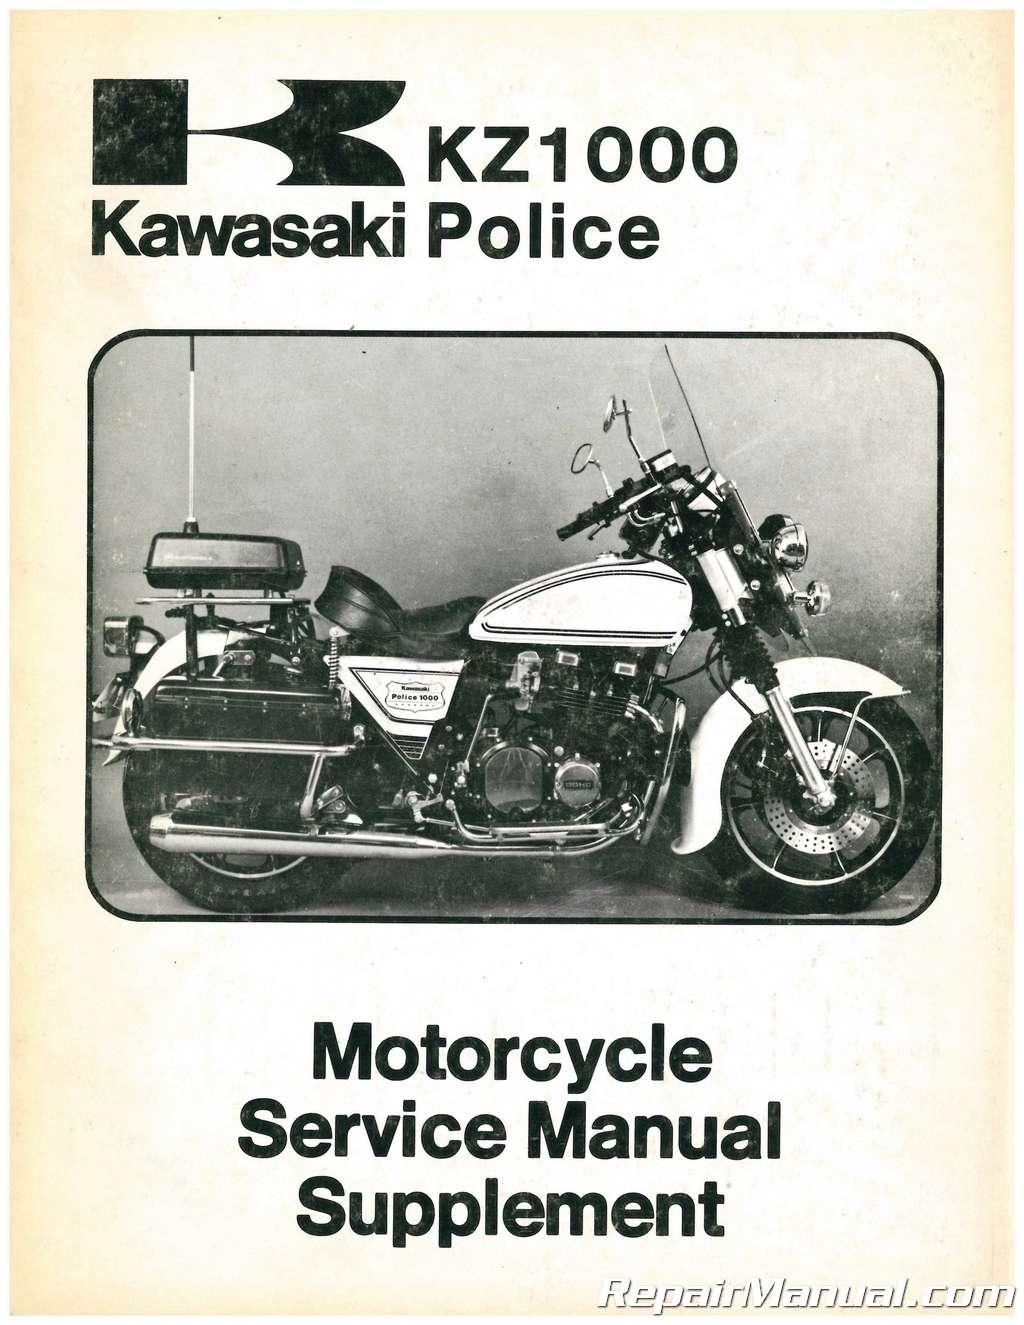 Used 1979 Kawasaki KZ1000 C2 Police Motorcycle Service Manual Supplement